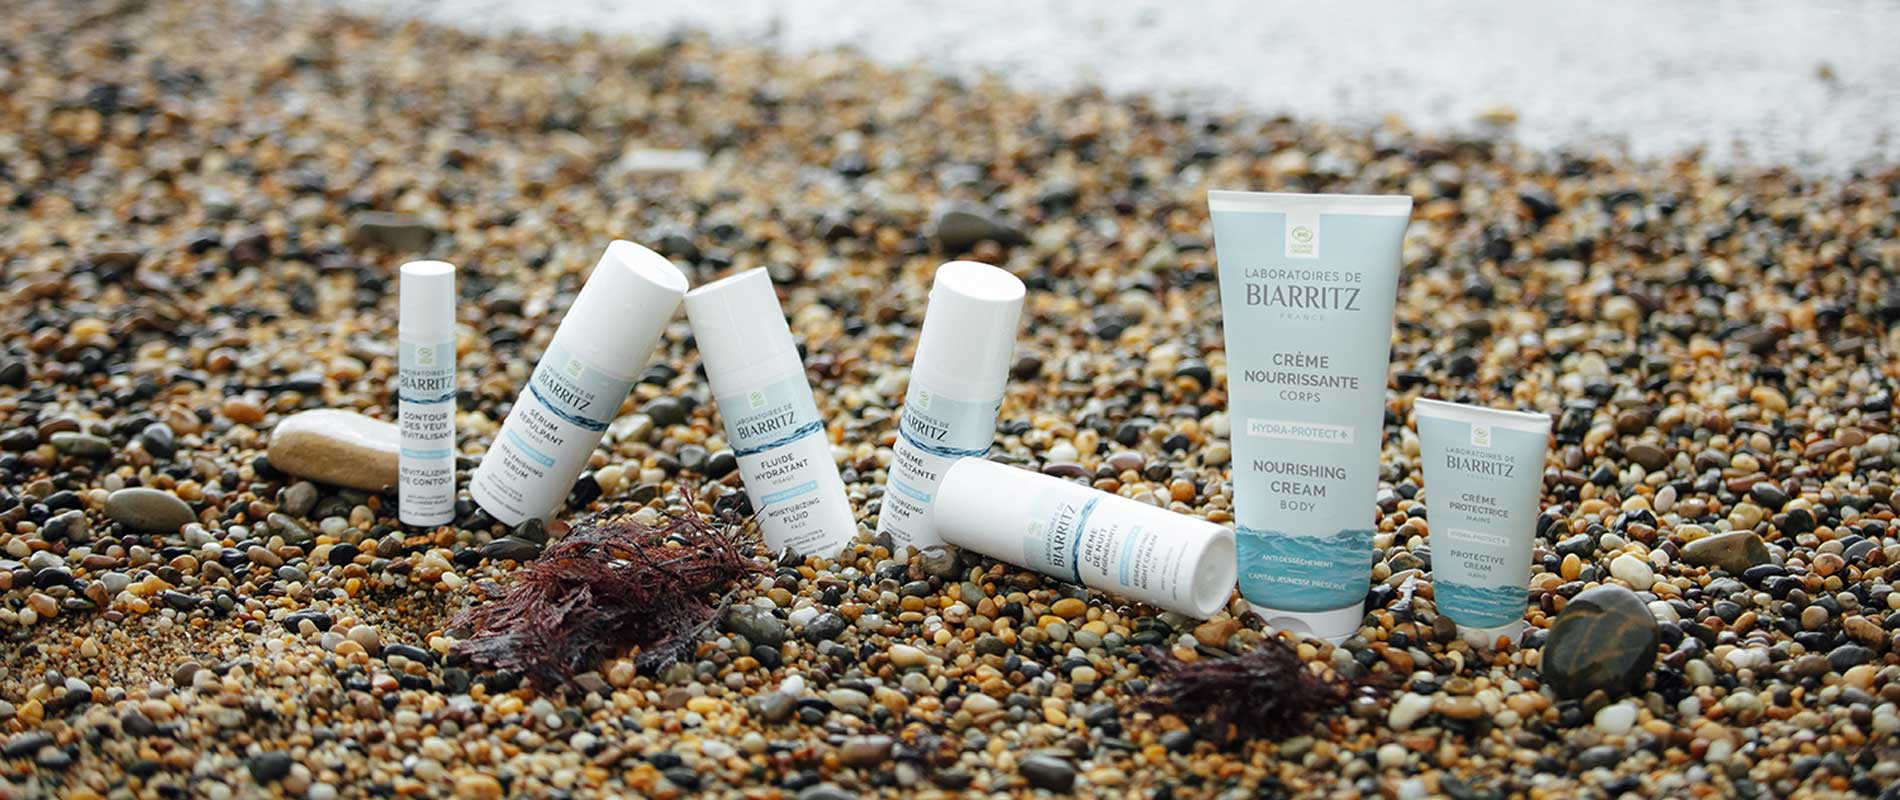 Hydra-Protect+: Multi-Action Skincare from Laboratoires de Biarritz